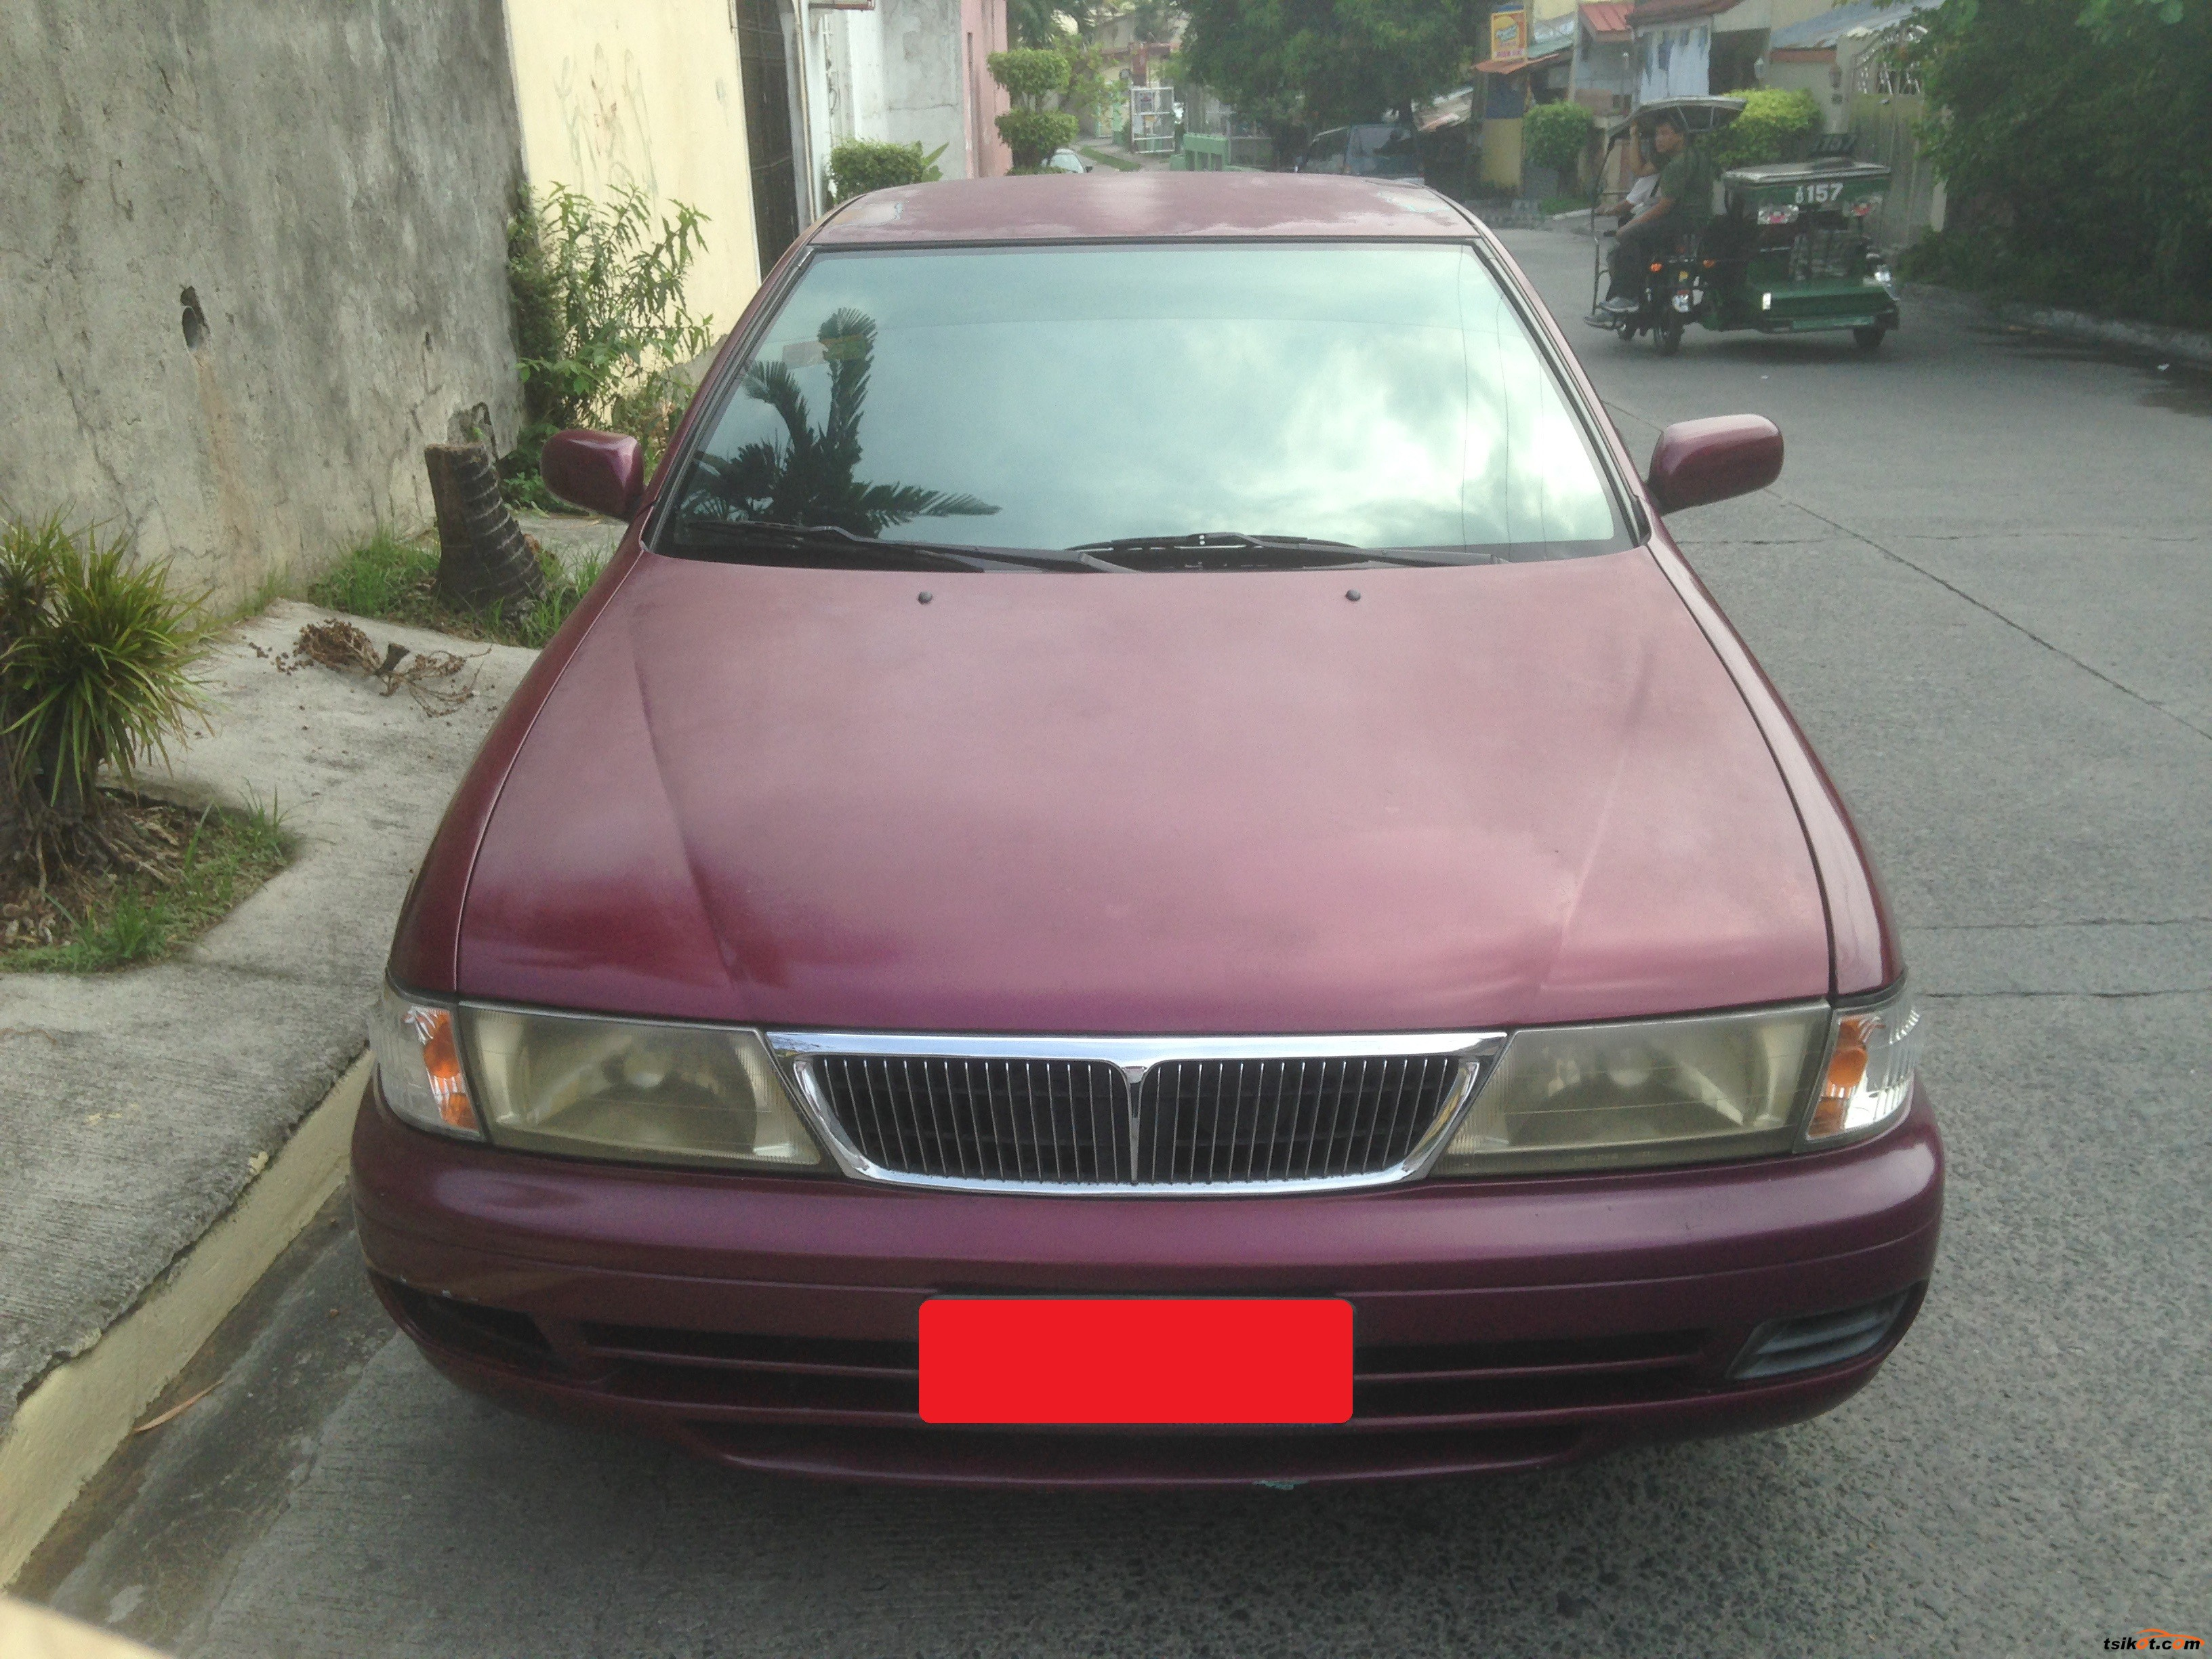 Nissan Sentra 1998 - 1